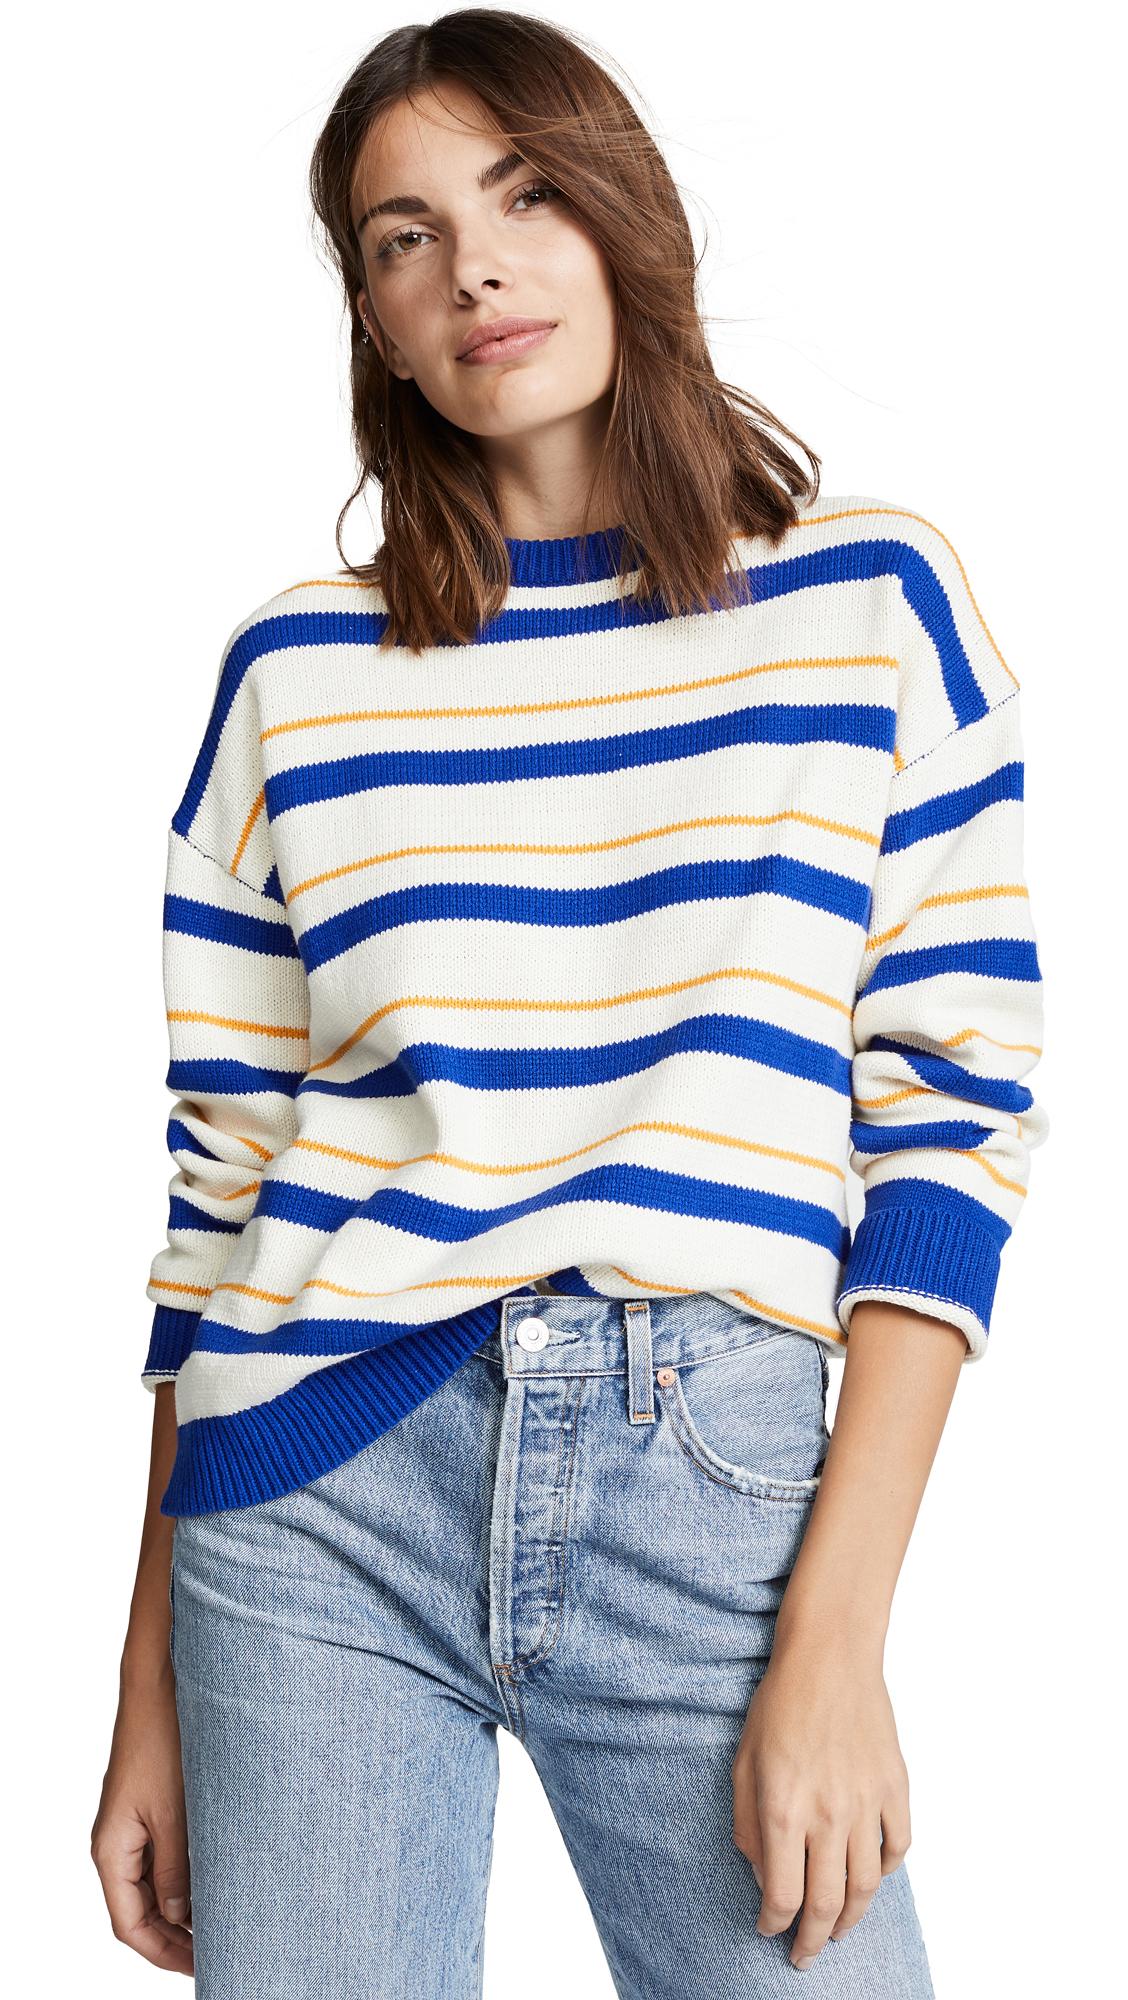 LOST + WANDER After Glow Sweater in Blue Multi